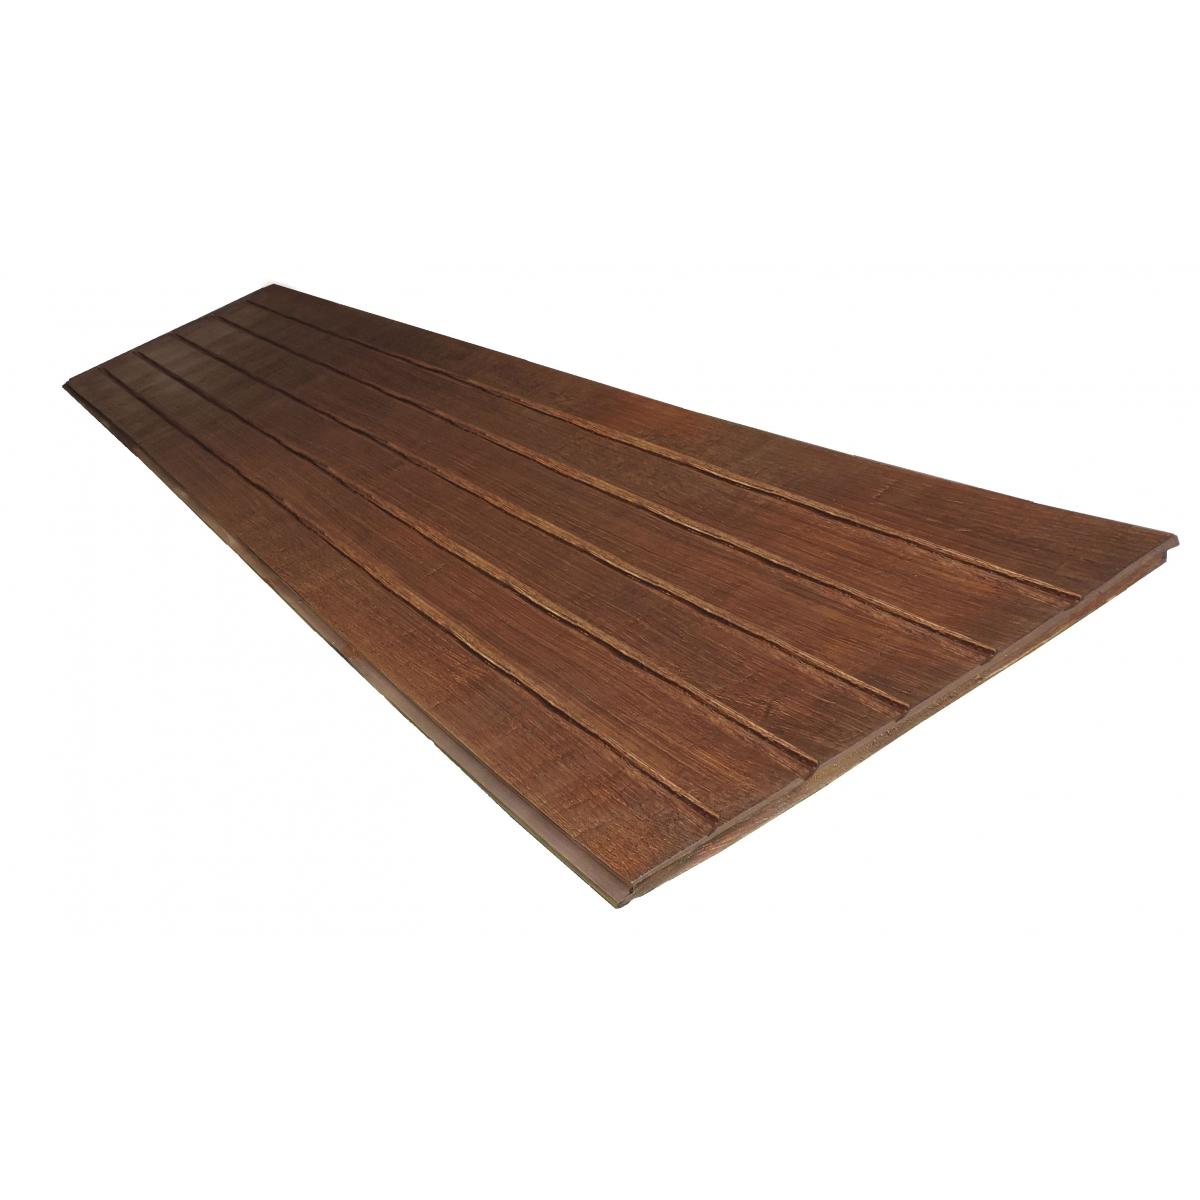 Panel rústico de seis lamas imitación madera de 300x62cm